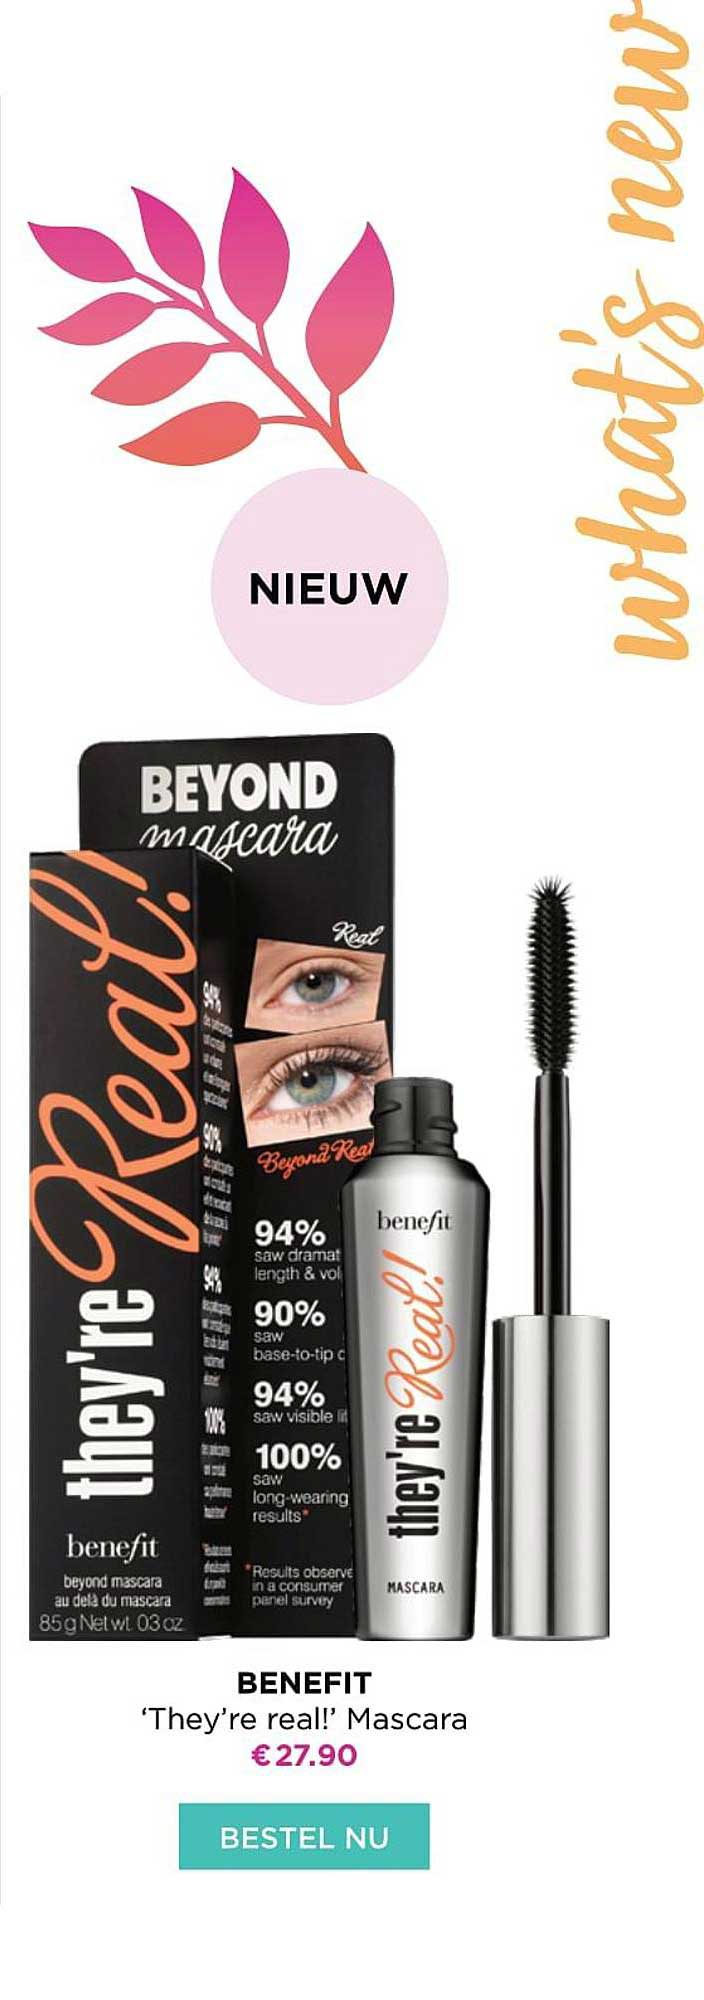 ICI PARIS XL Benefit 'they're Real! Mascara